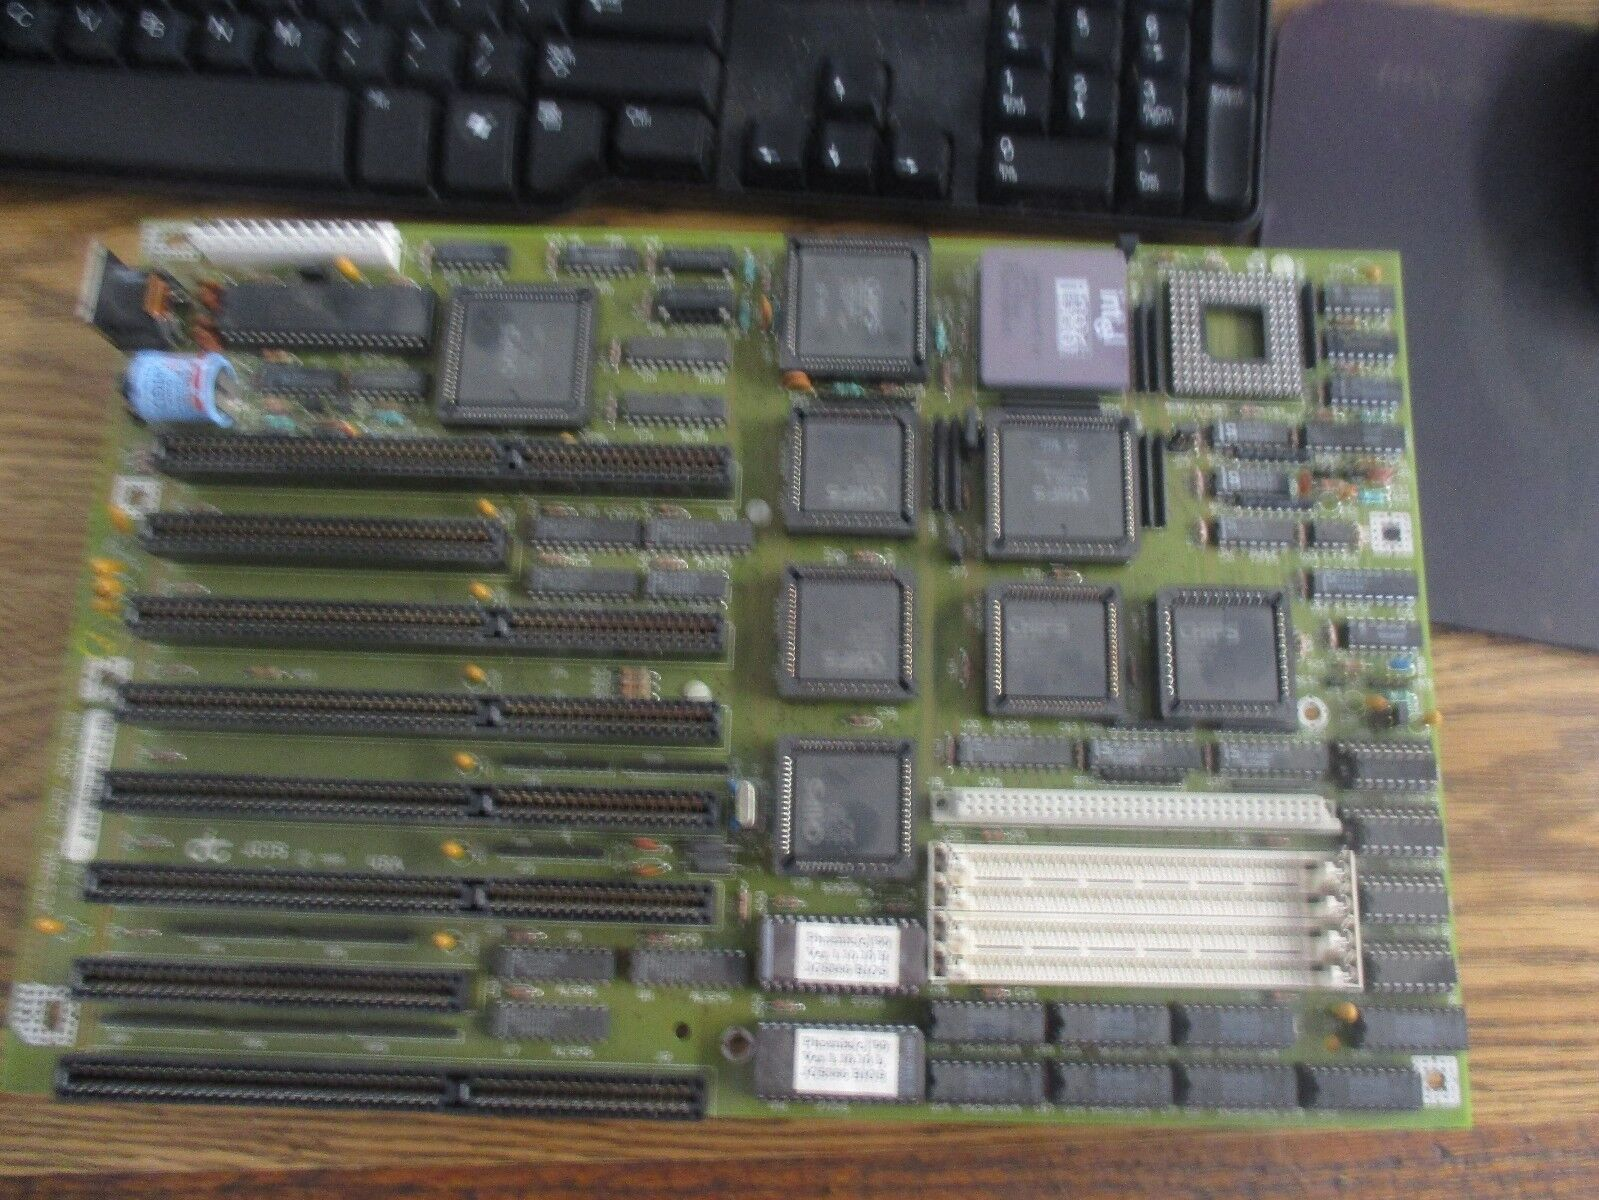 I//O IO GIGABYTE SHIELD BACKPLATE FOR GA-870A-USB3,GA-P55-UD3,GA-870-UD3P